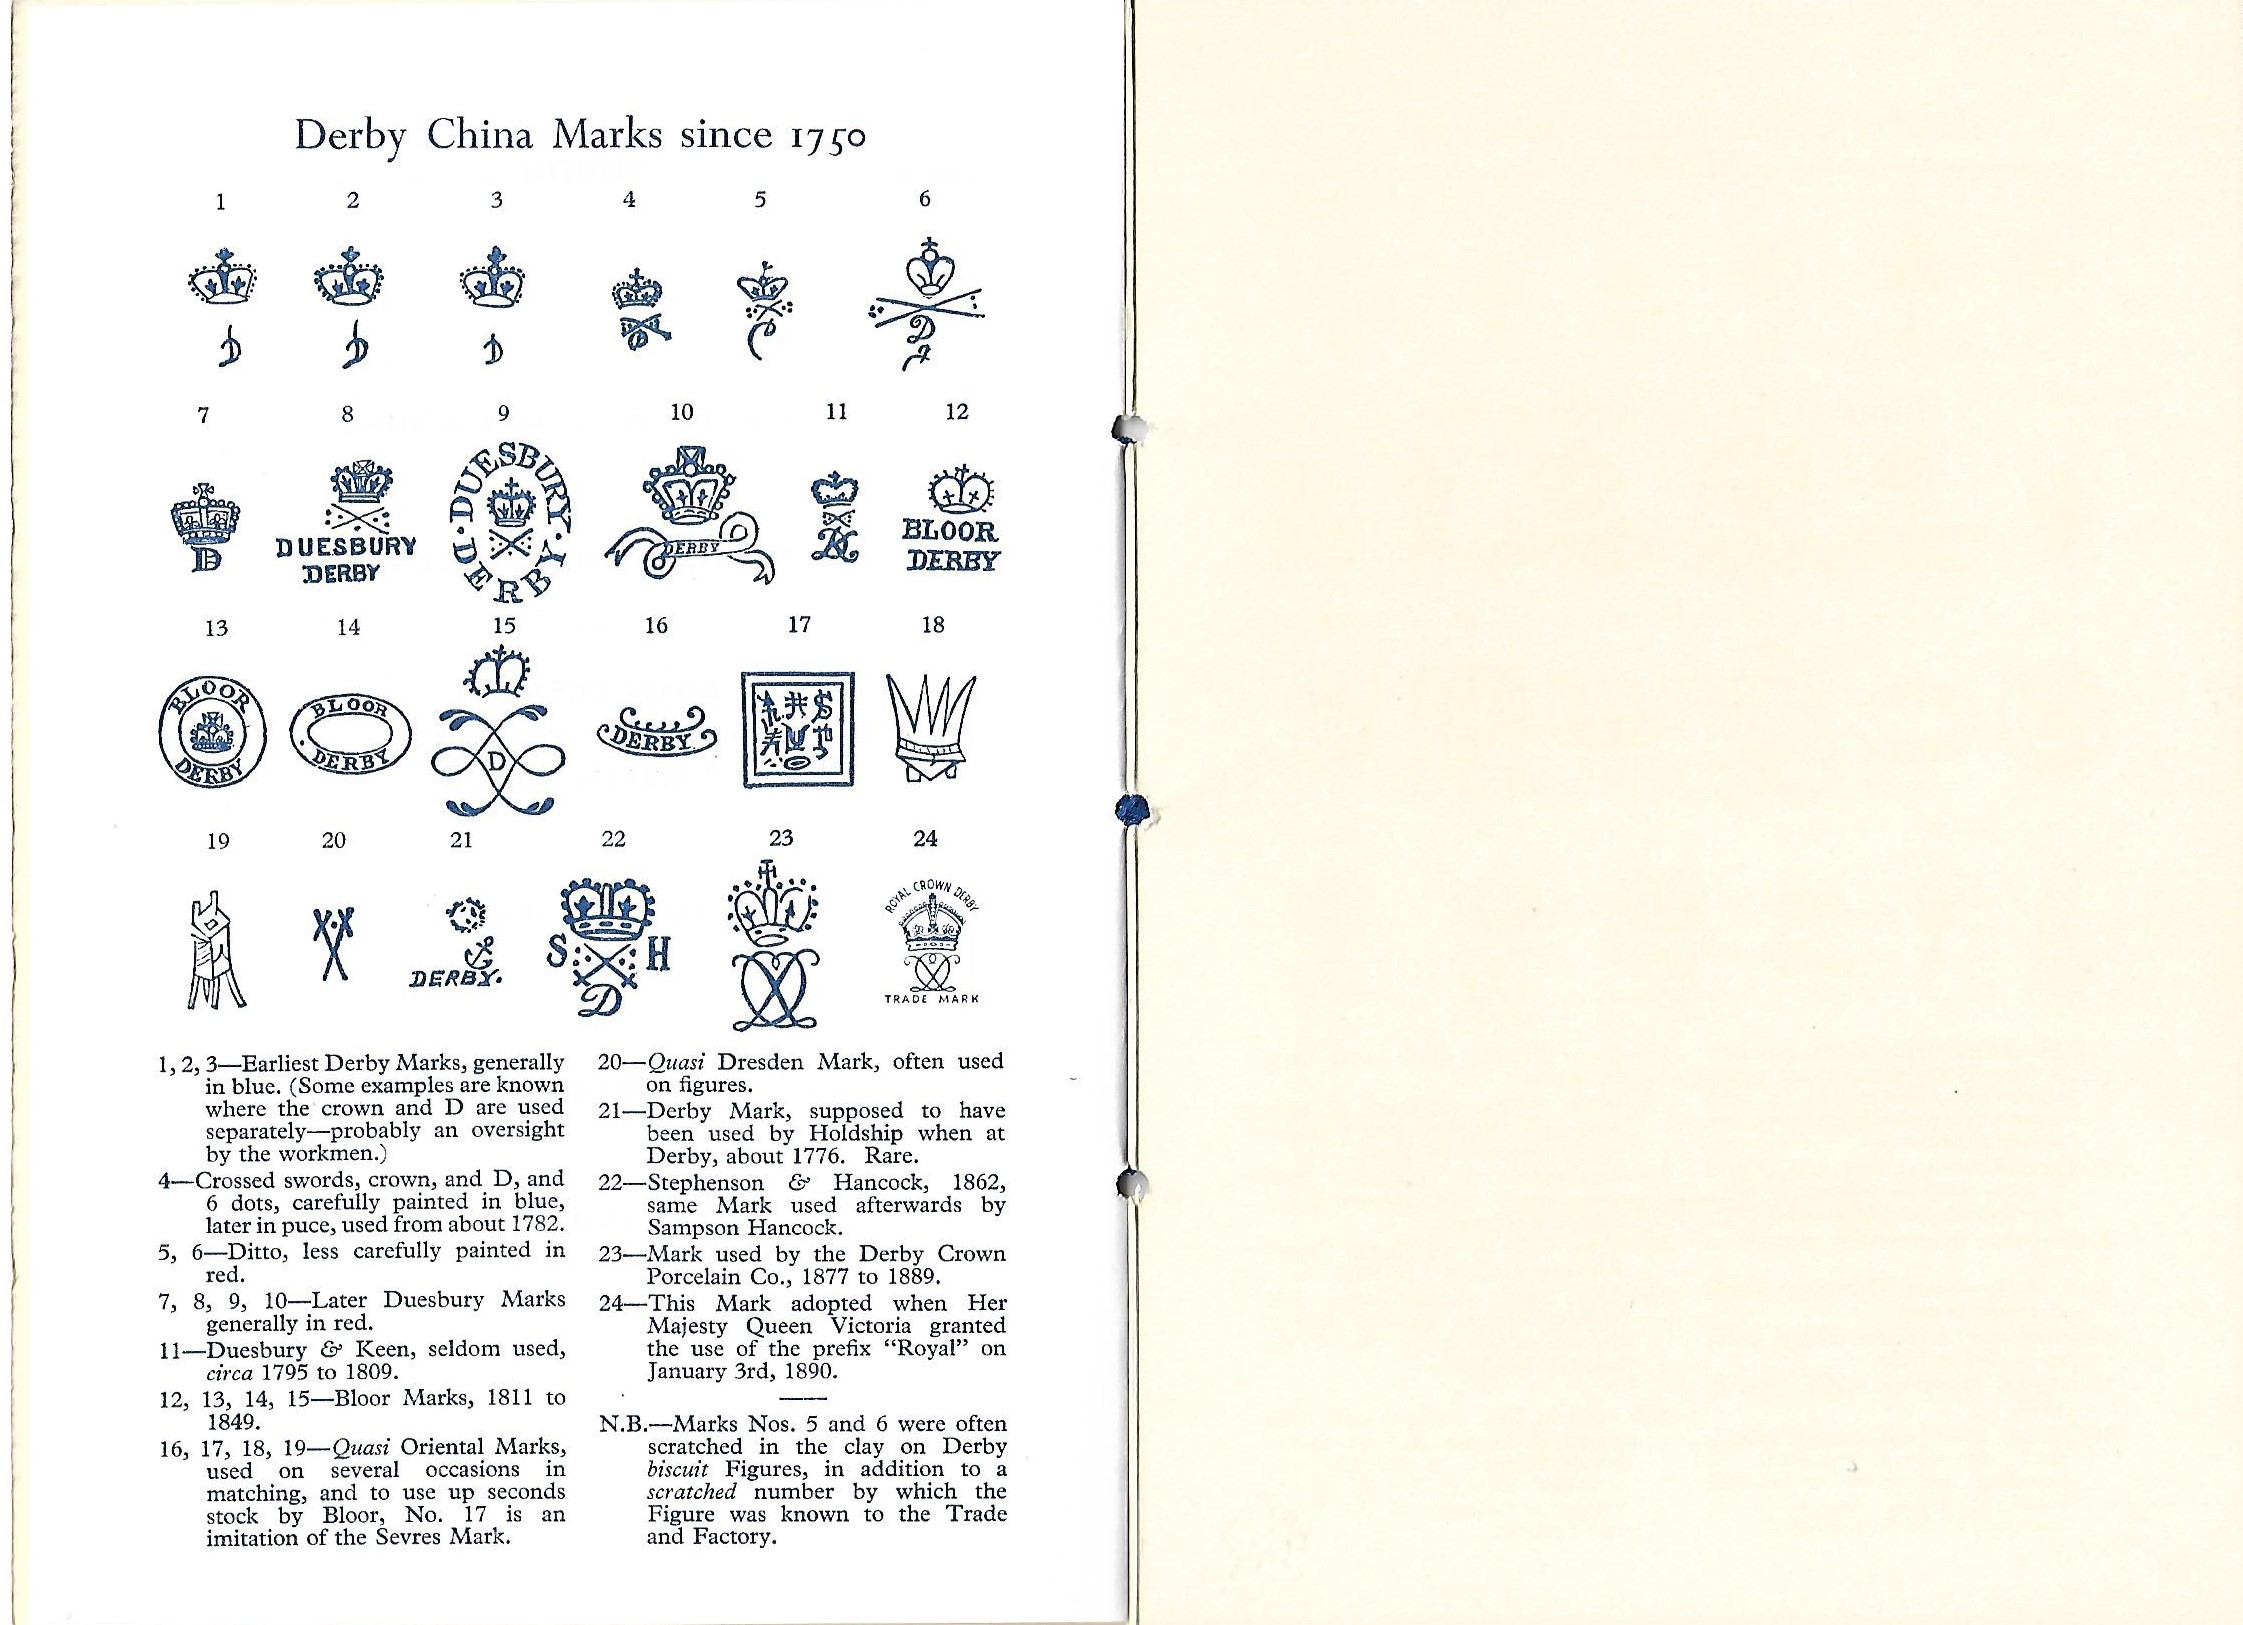 royal-crown-derby-bicentenary-dinner-menu-1950-page-4